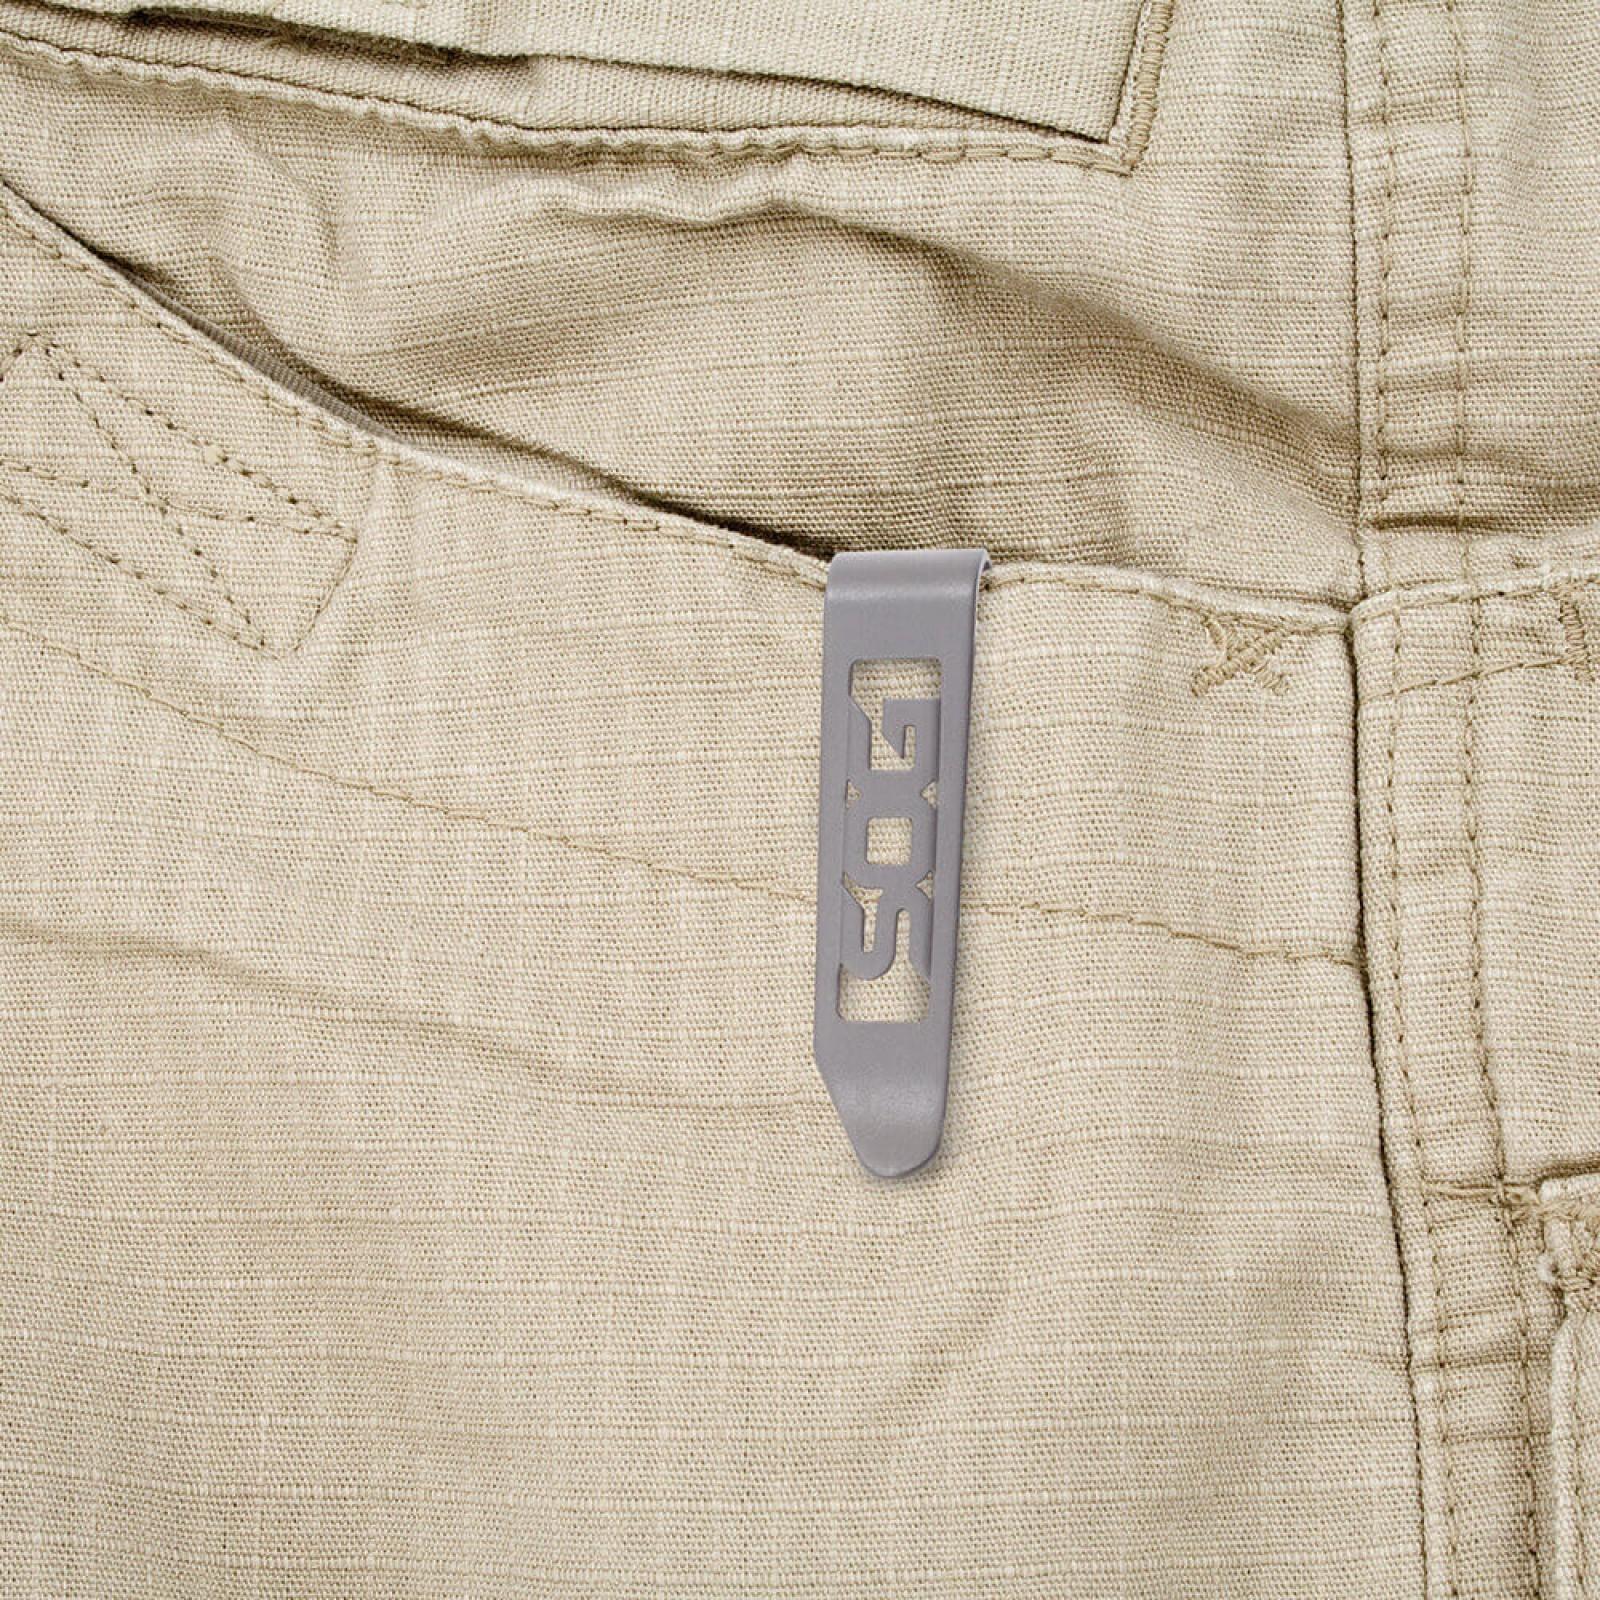 Фото 14 - Складной нож TRIDENT - SOG TF2, сталь AUS-8, рукоять термопластик GRN